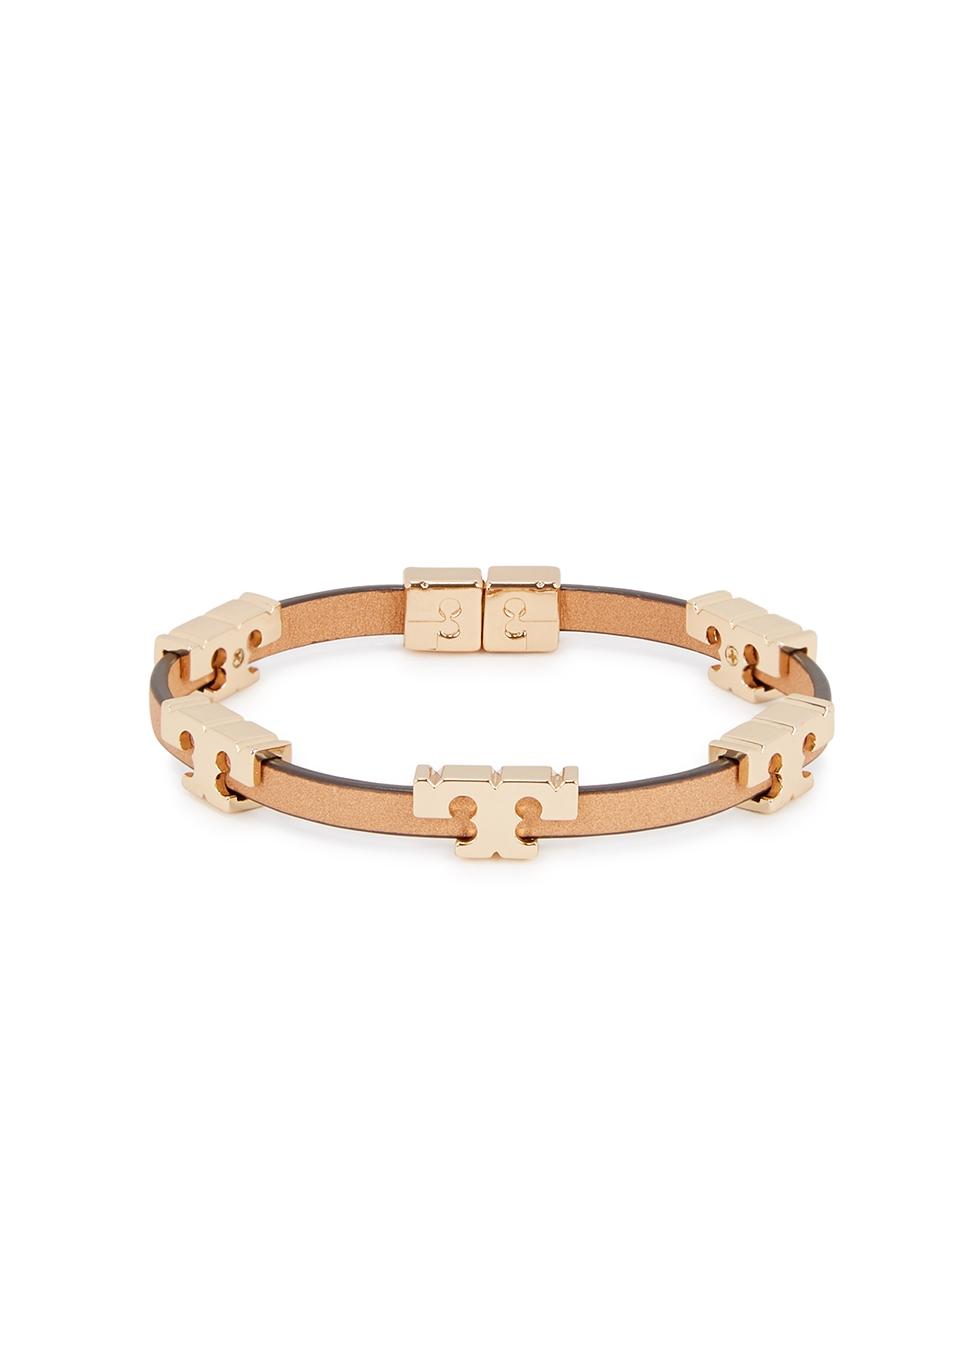 Serif-T brown leather bracelet